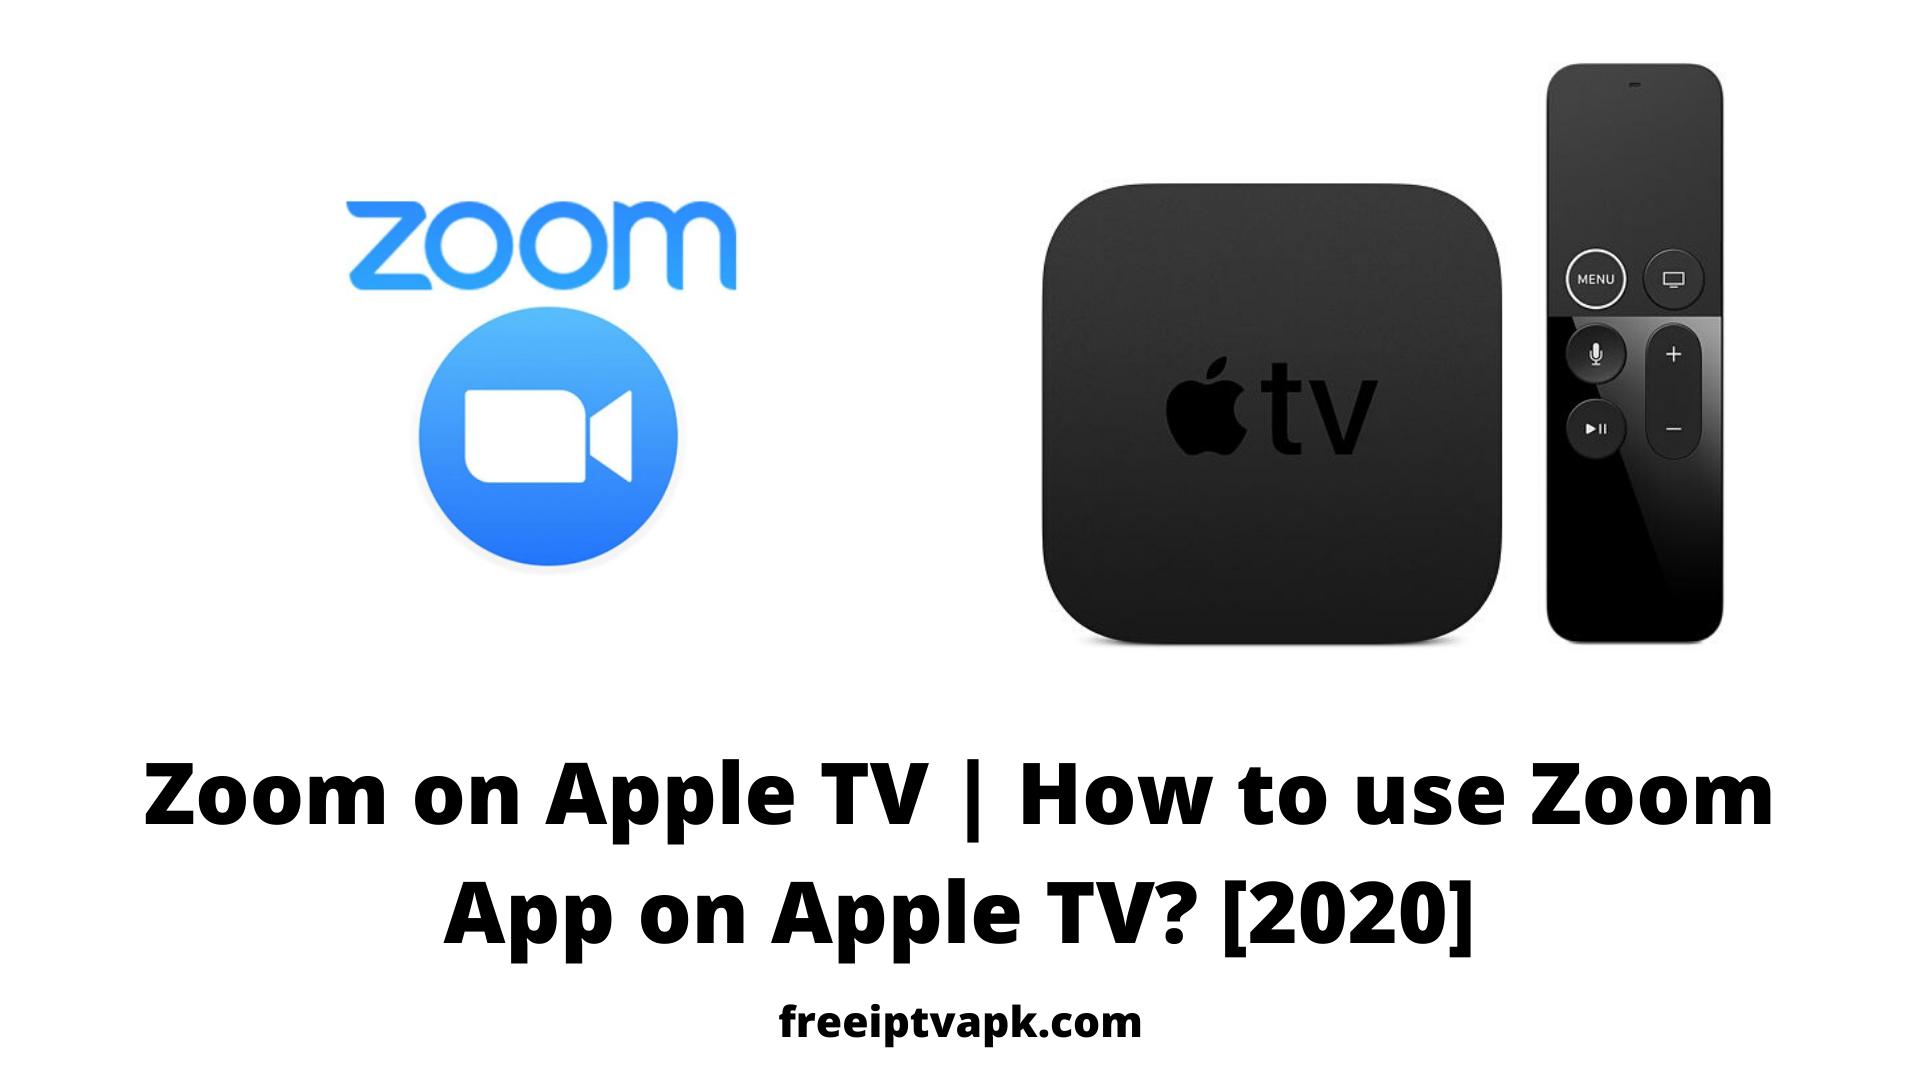 Zoom on Apple TV  How to use Zoom App on Apple TV? [8]